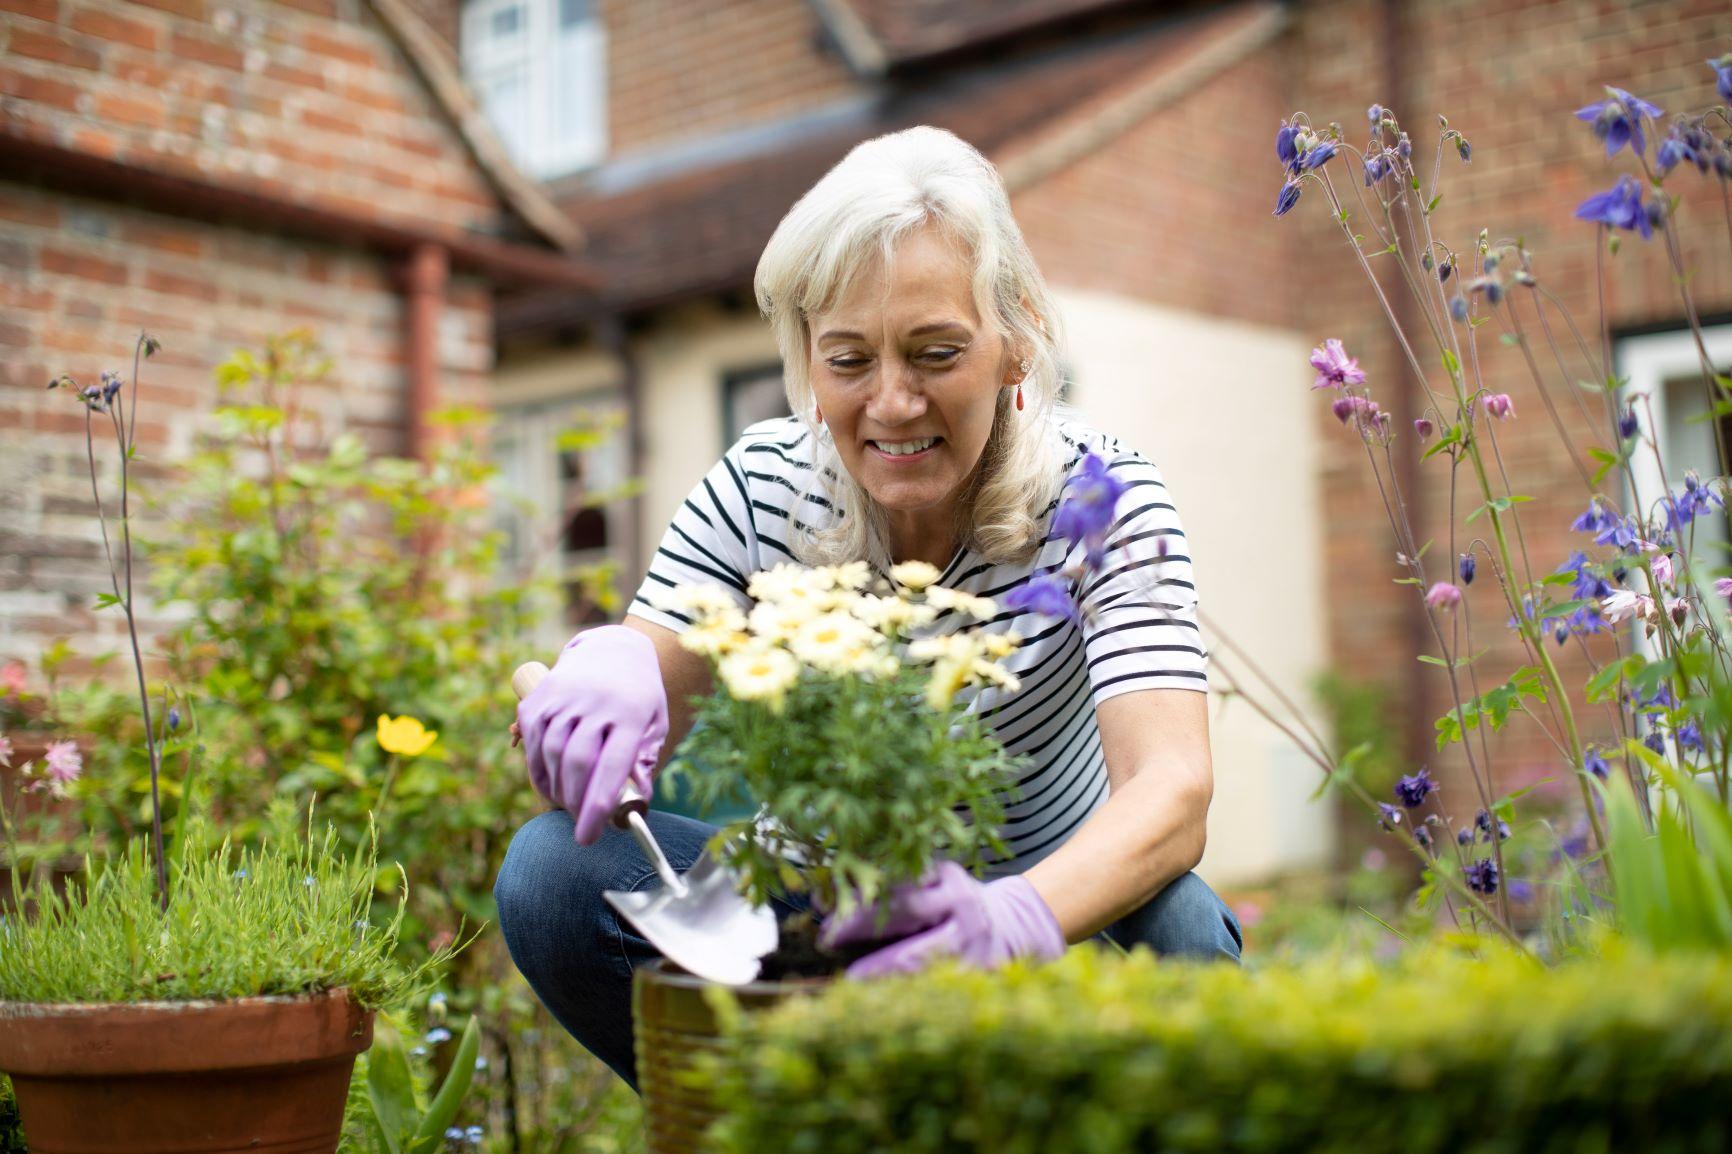 Gardening woman_iStock-1152789022-Resized